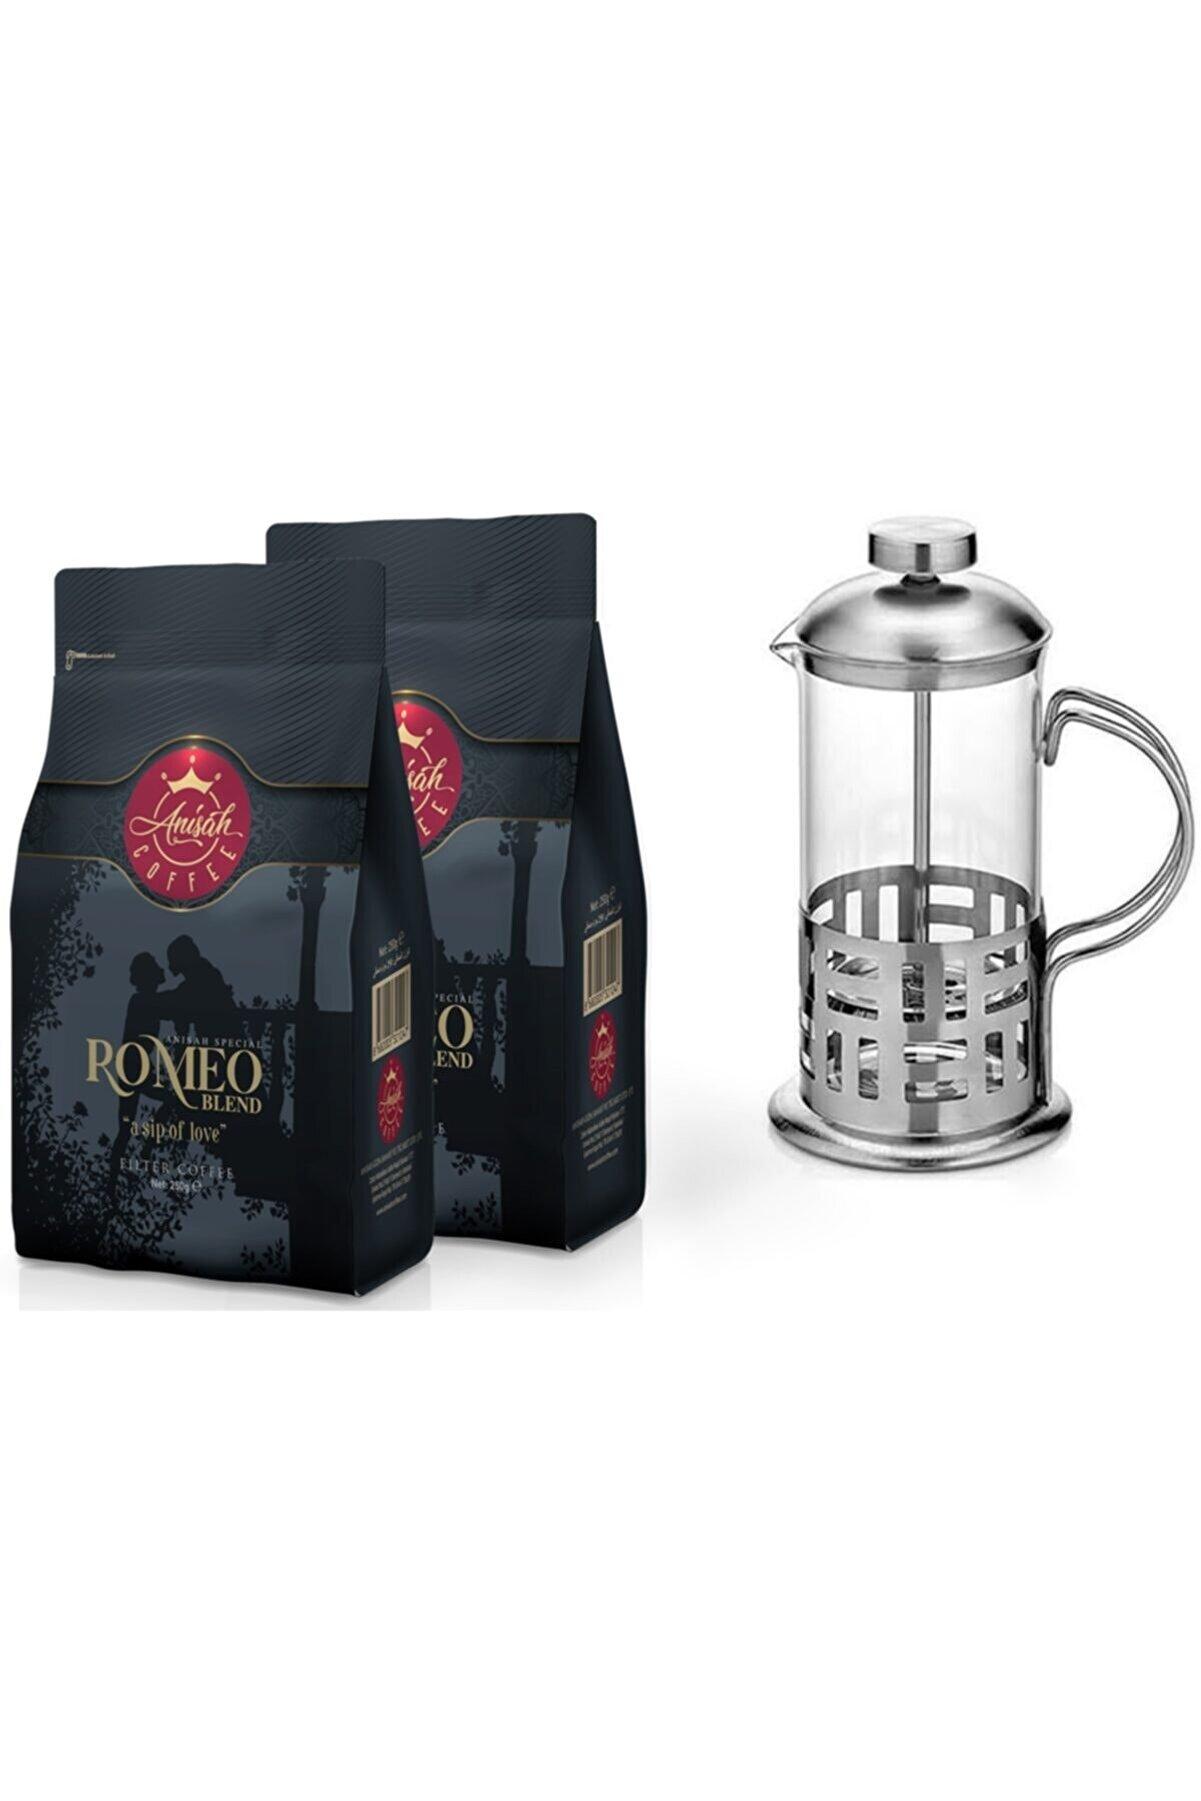 Anisah Coffee Filtre Kahve Romeo Blend Öğütülmüş - 350 ml French Press 2'li Paket (2*250 GR)